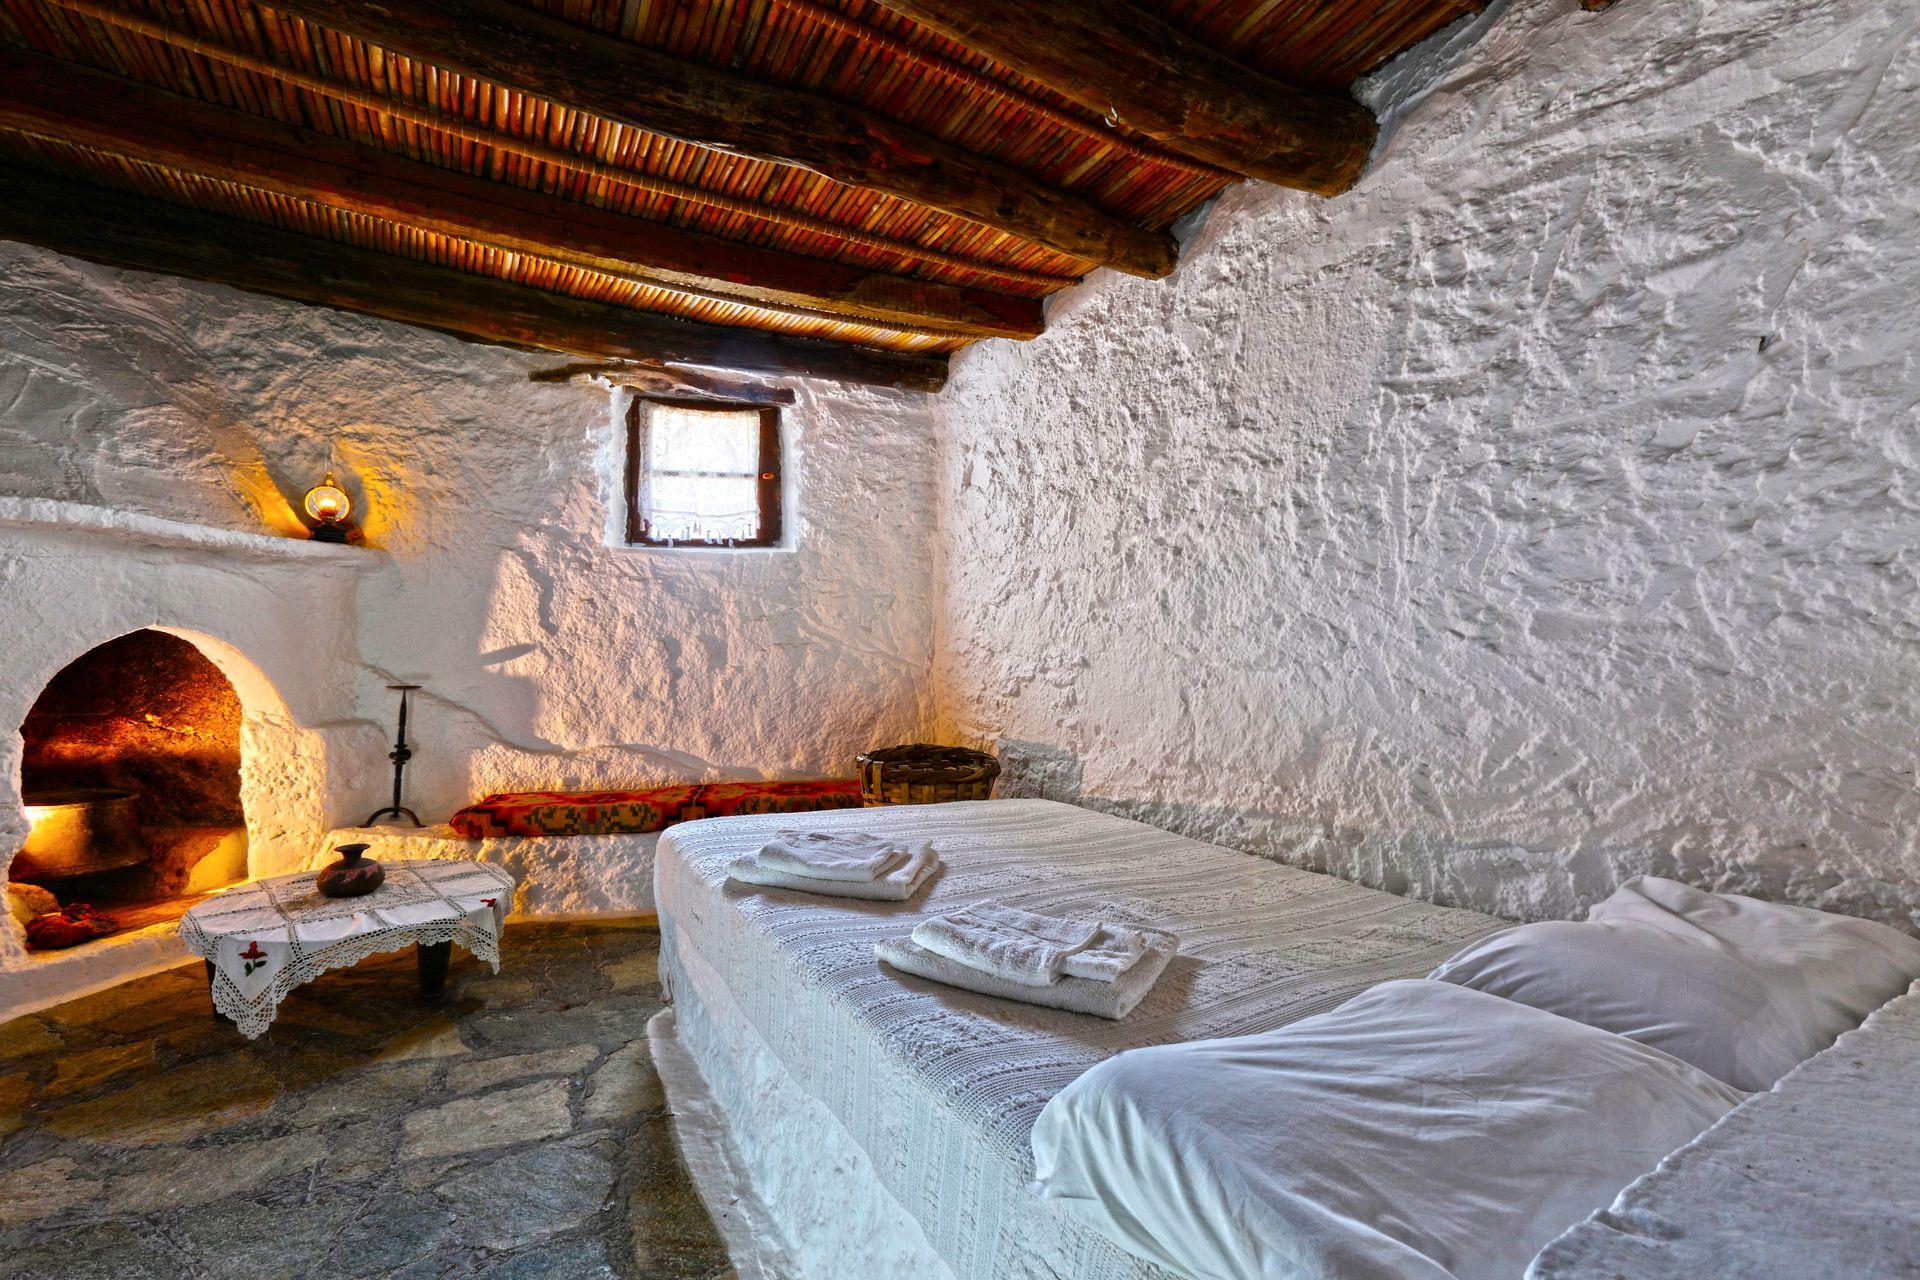 Aspros Potamos Houses - Μακρύς Γιαλός, Κρήτη ✦ 3 Ημέρες